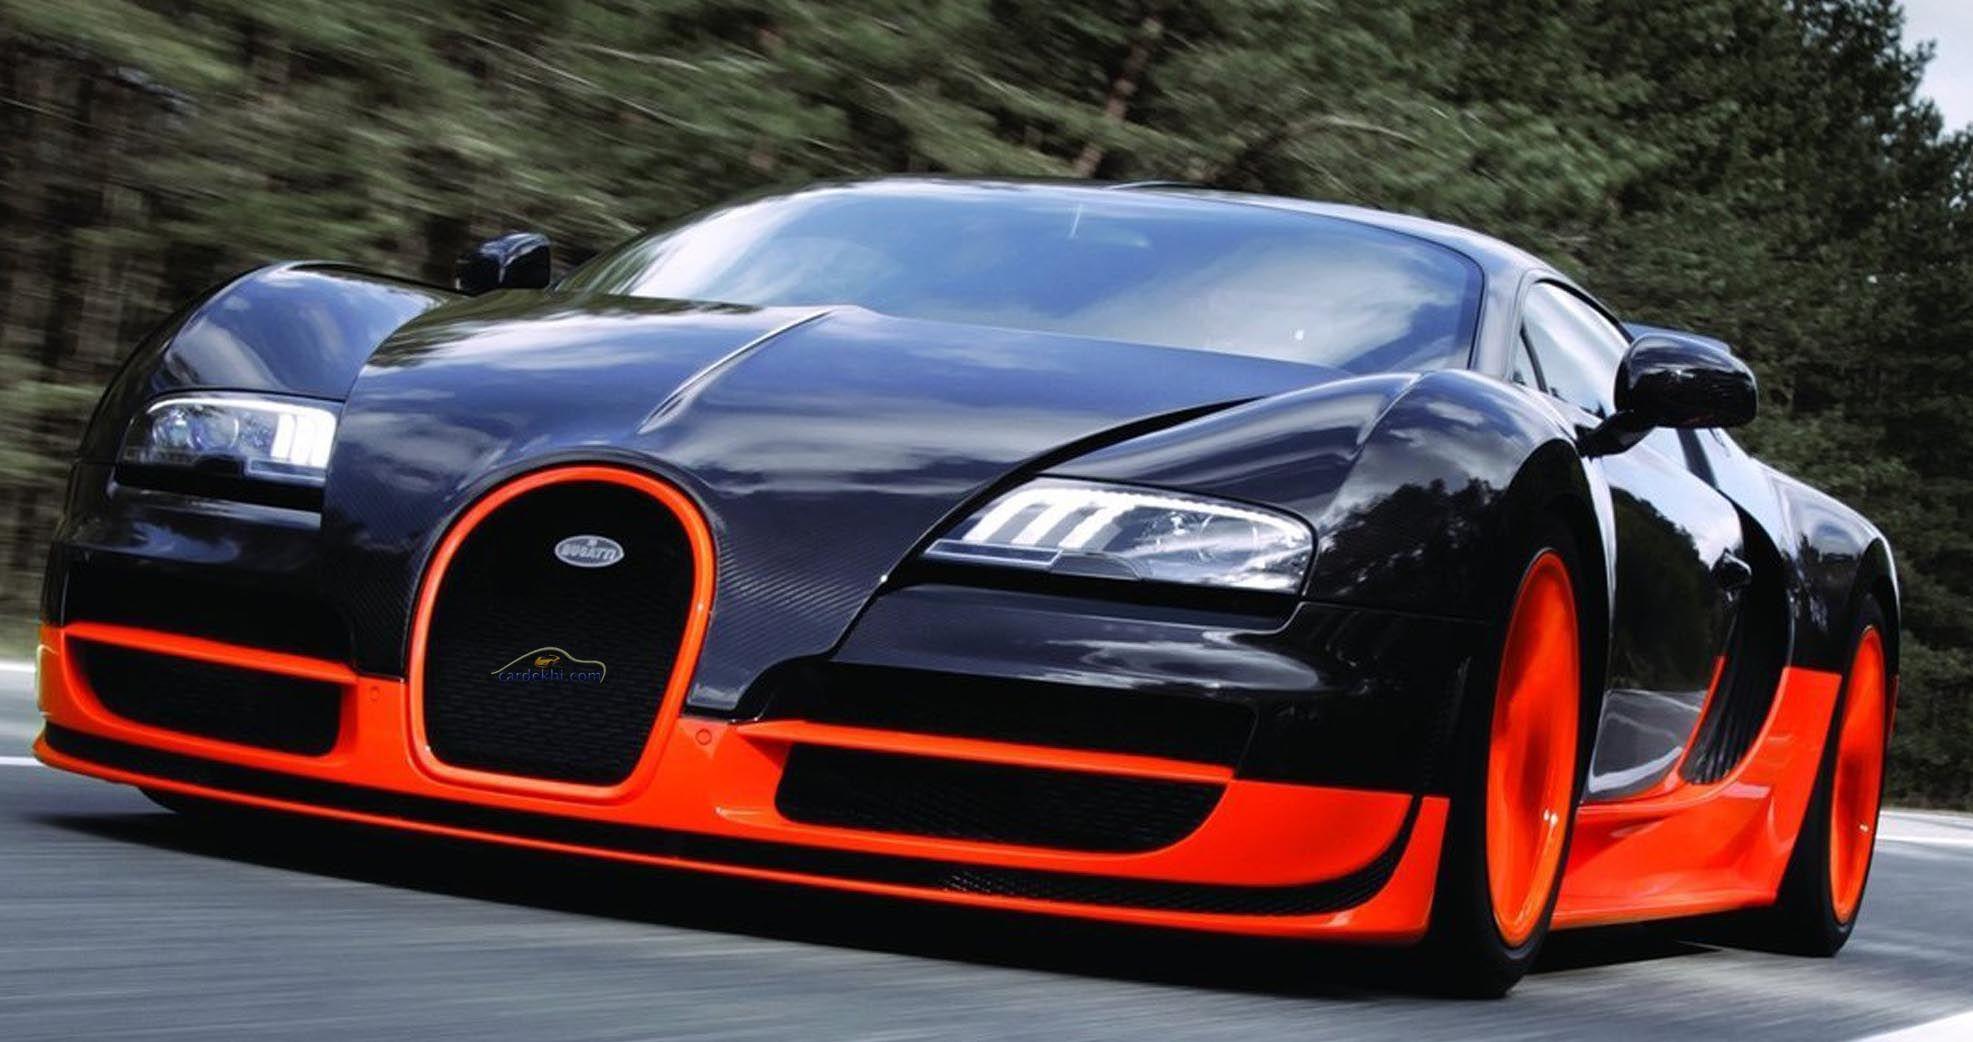 fast cars | top 10 fastest cars in the world 1 bugatti veyron ...